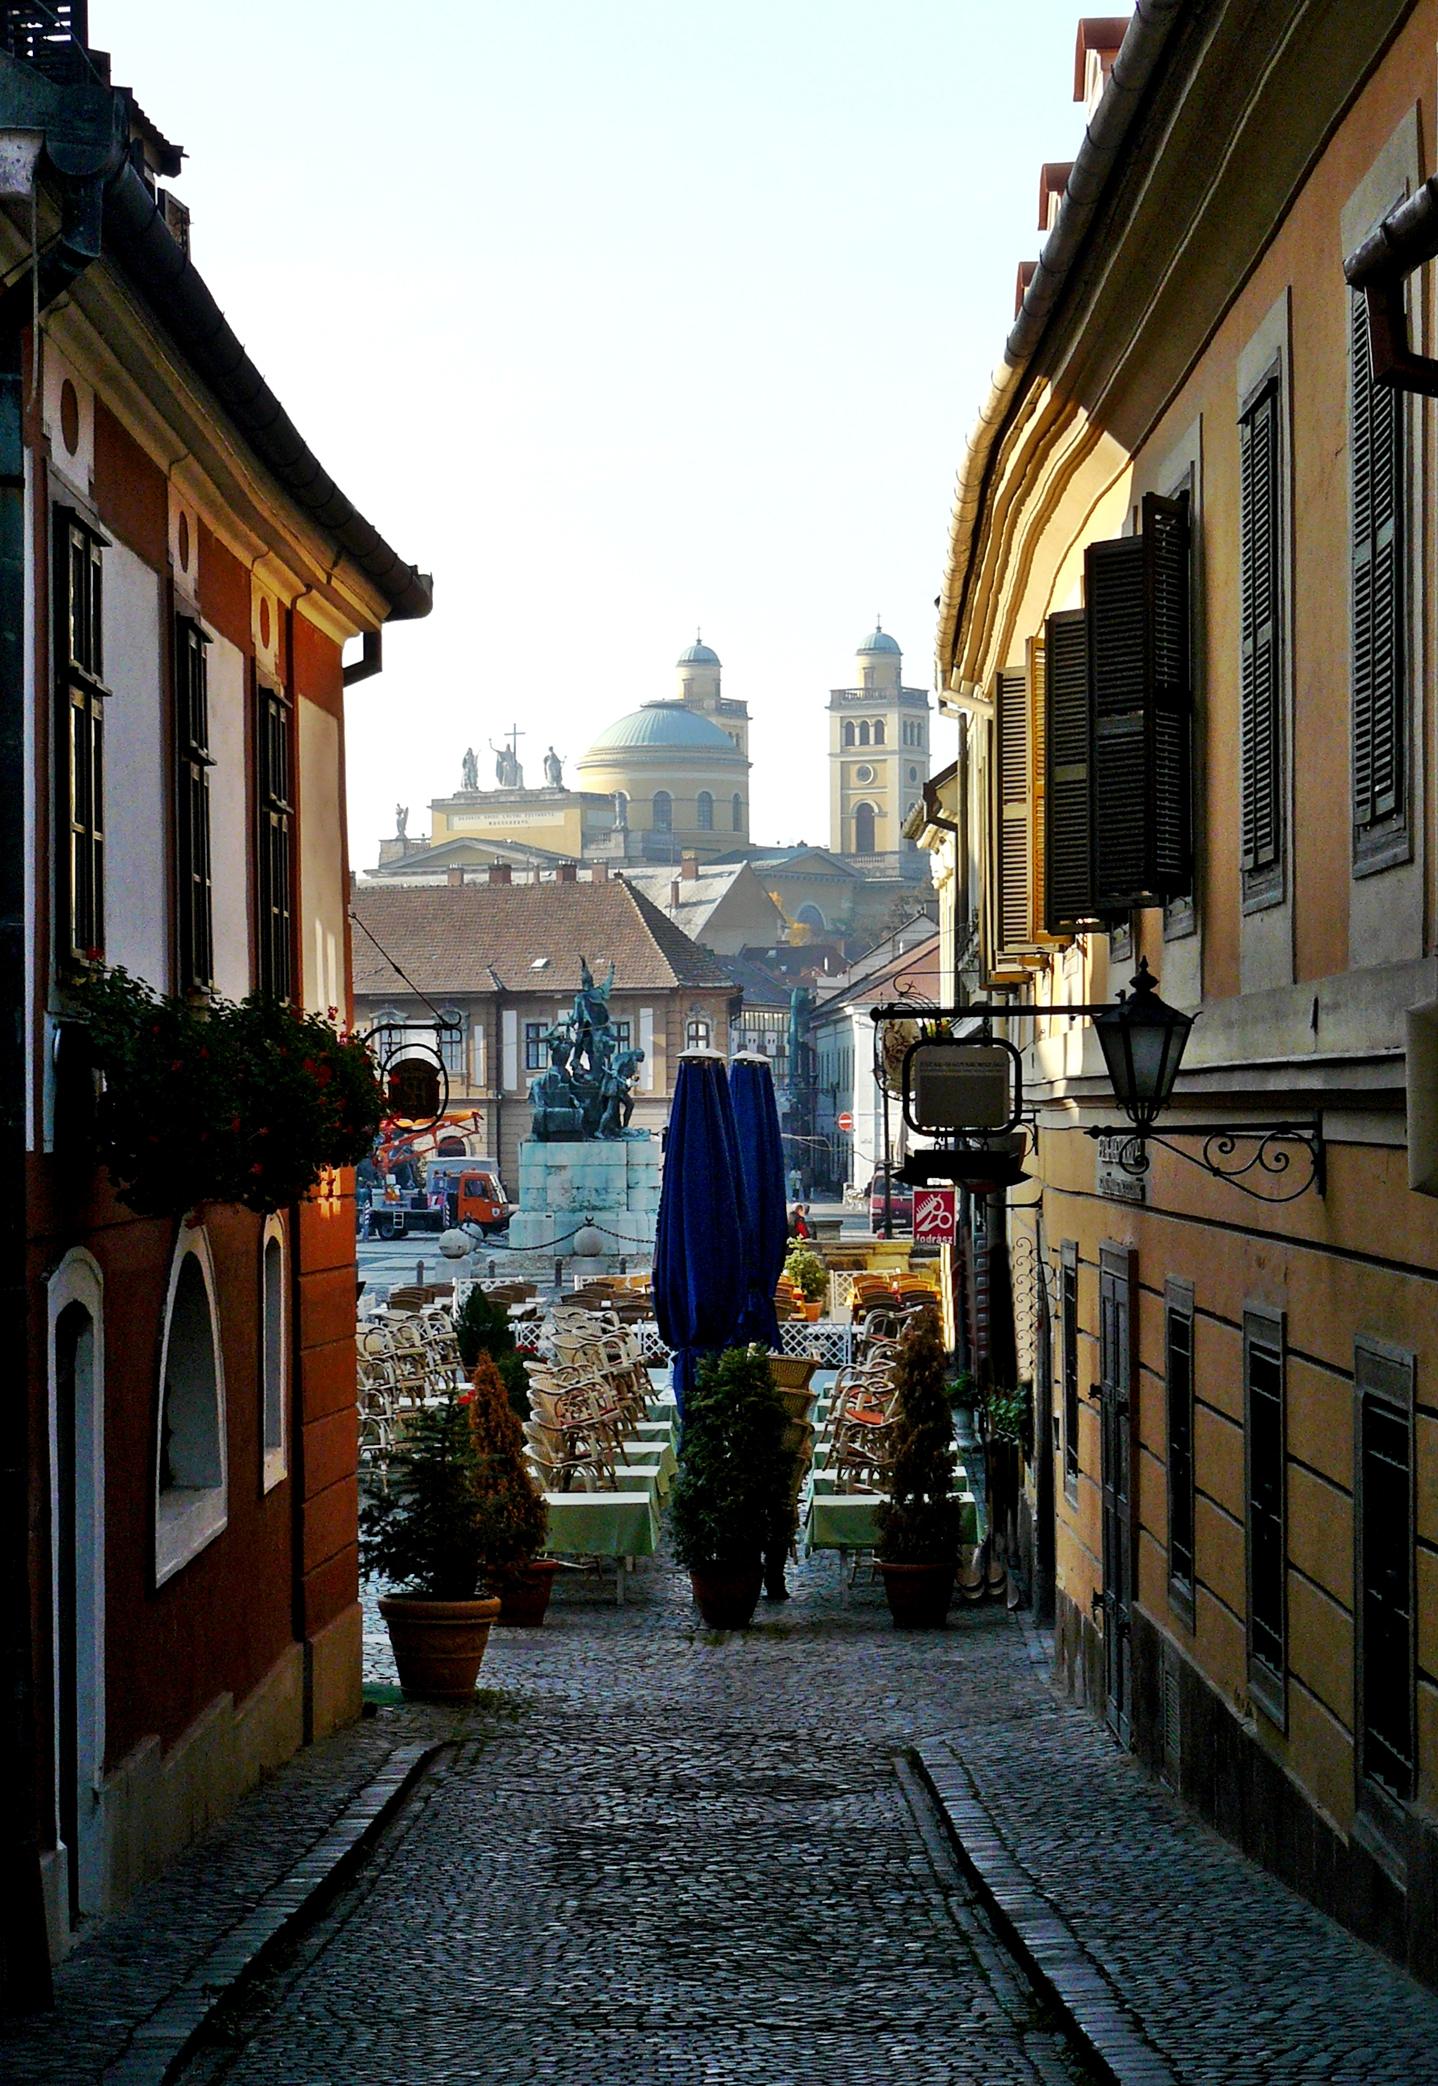 Medieval street in Eger